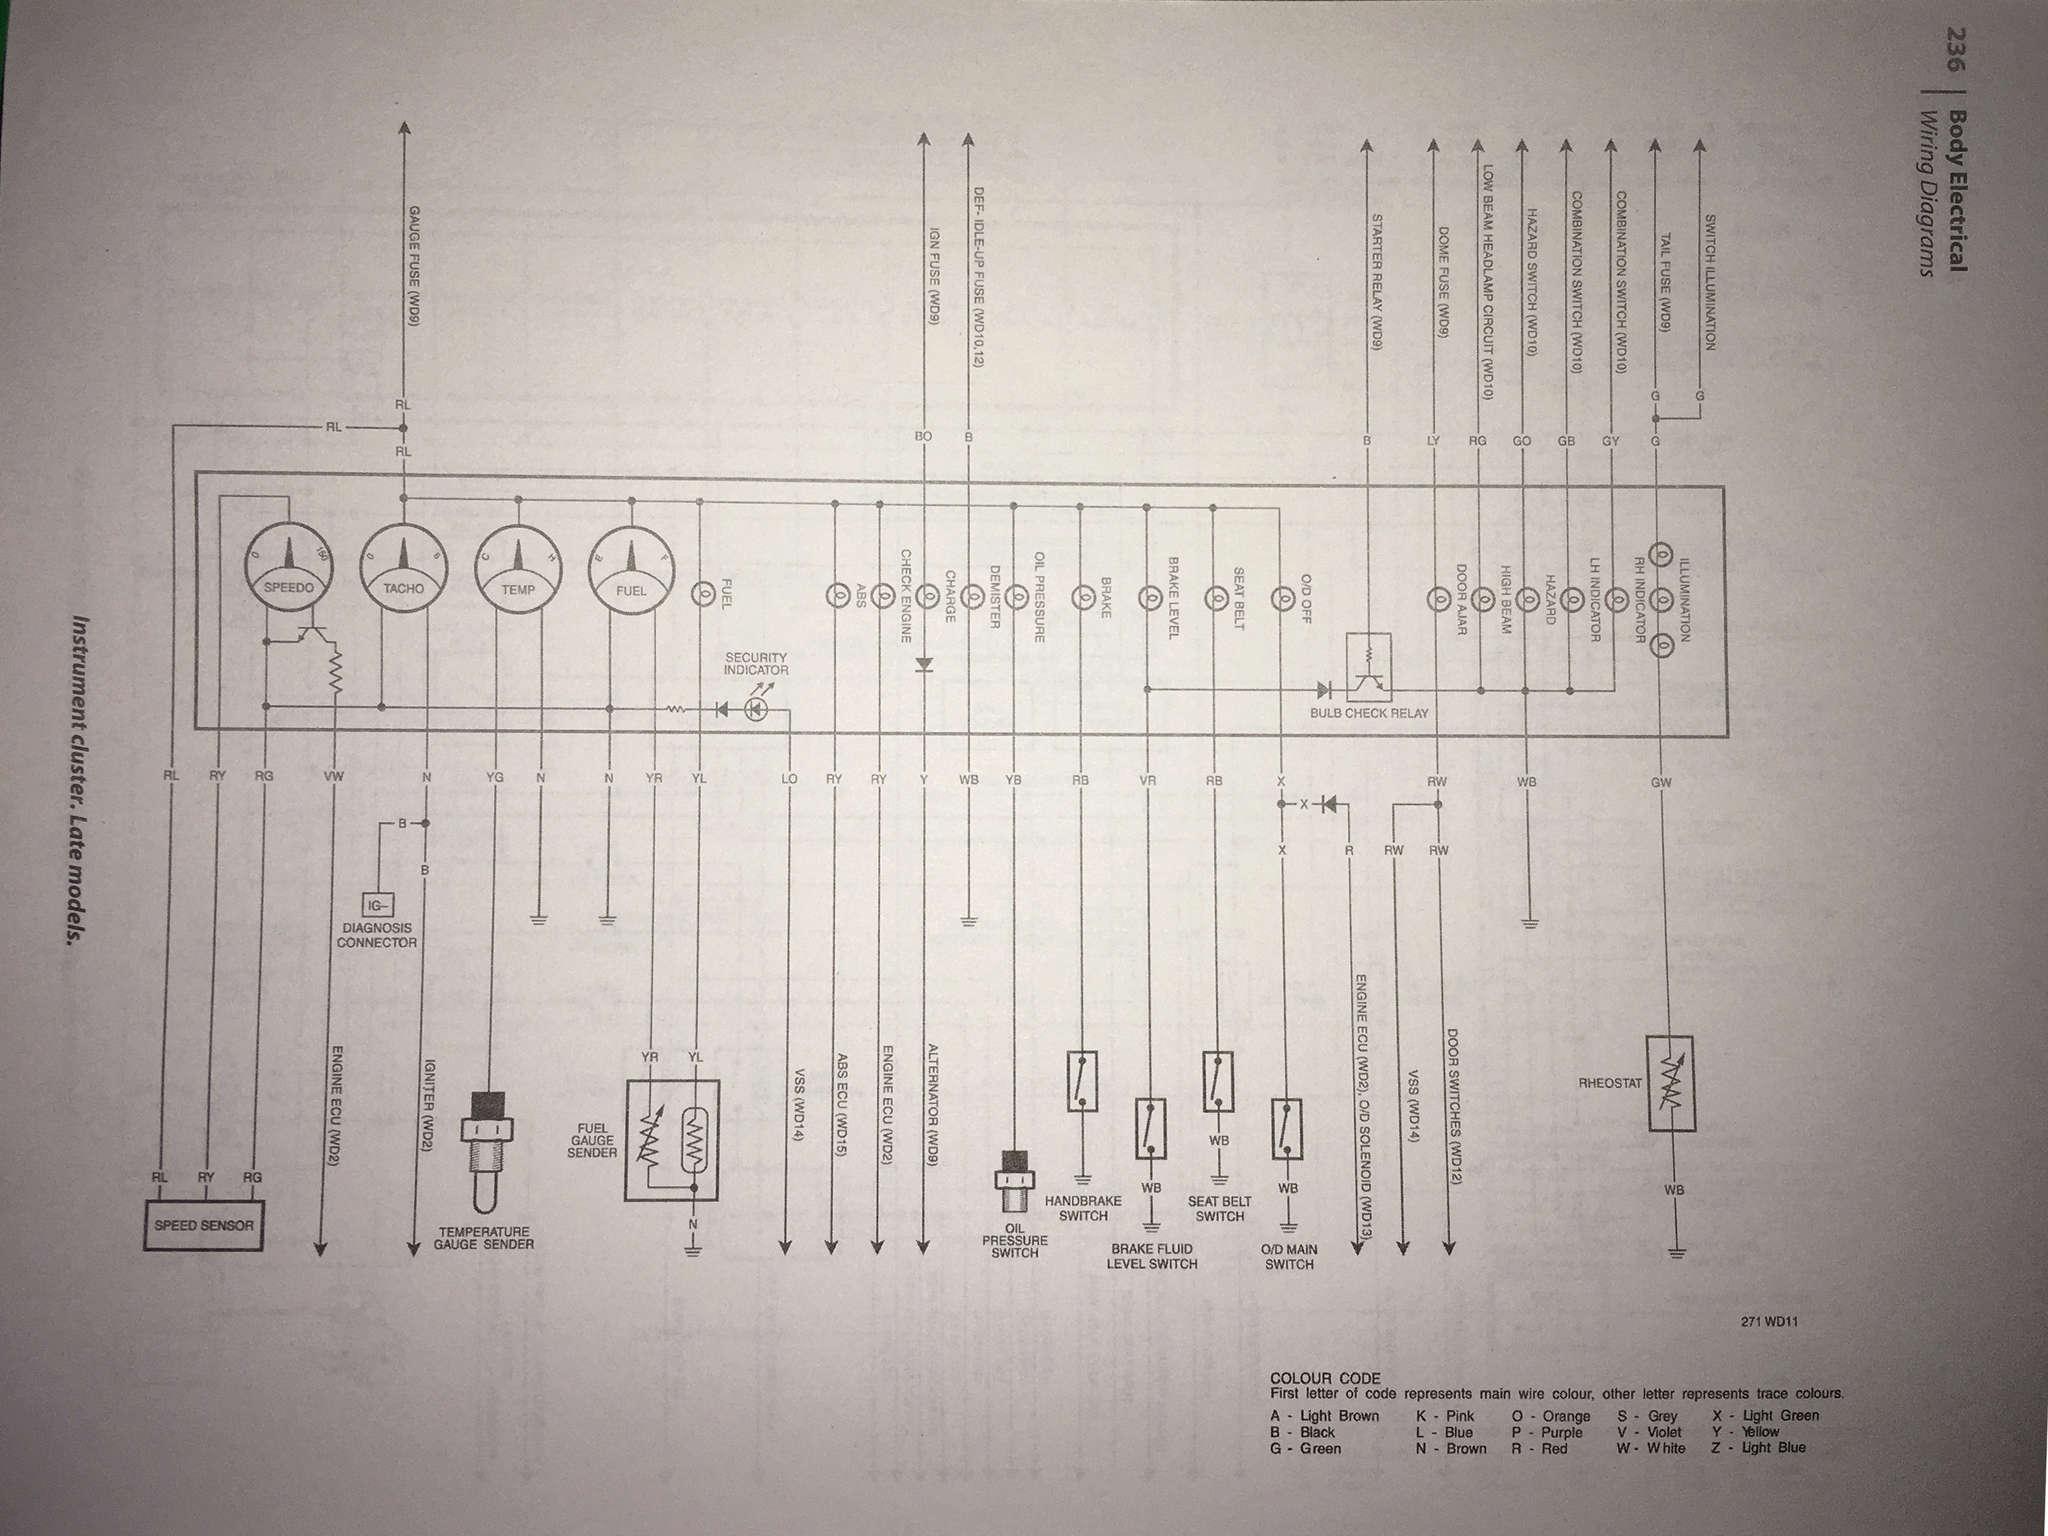 E6k Wiring Diagram. Battery Diagrams, Motor Diagrams, Pinout ...